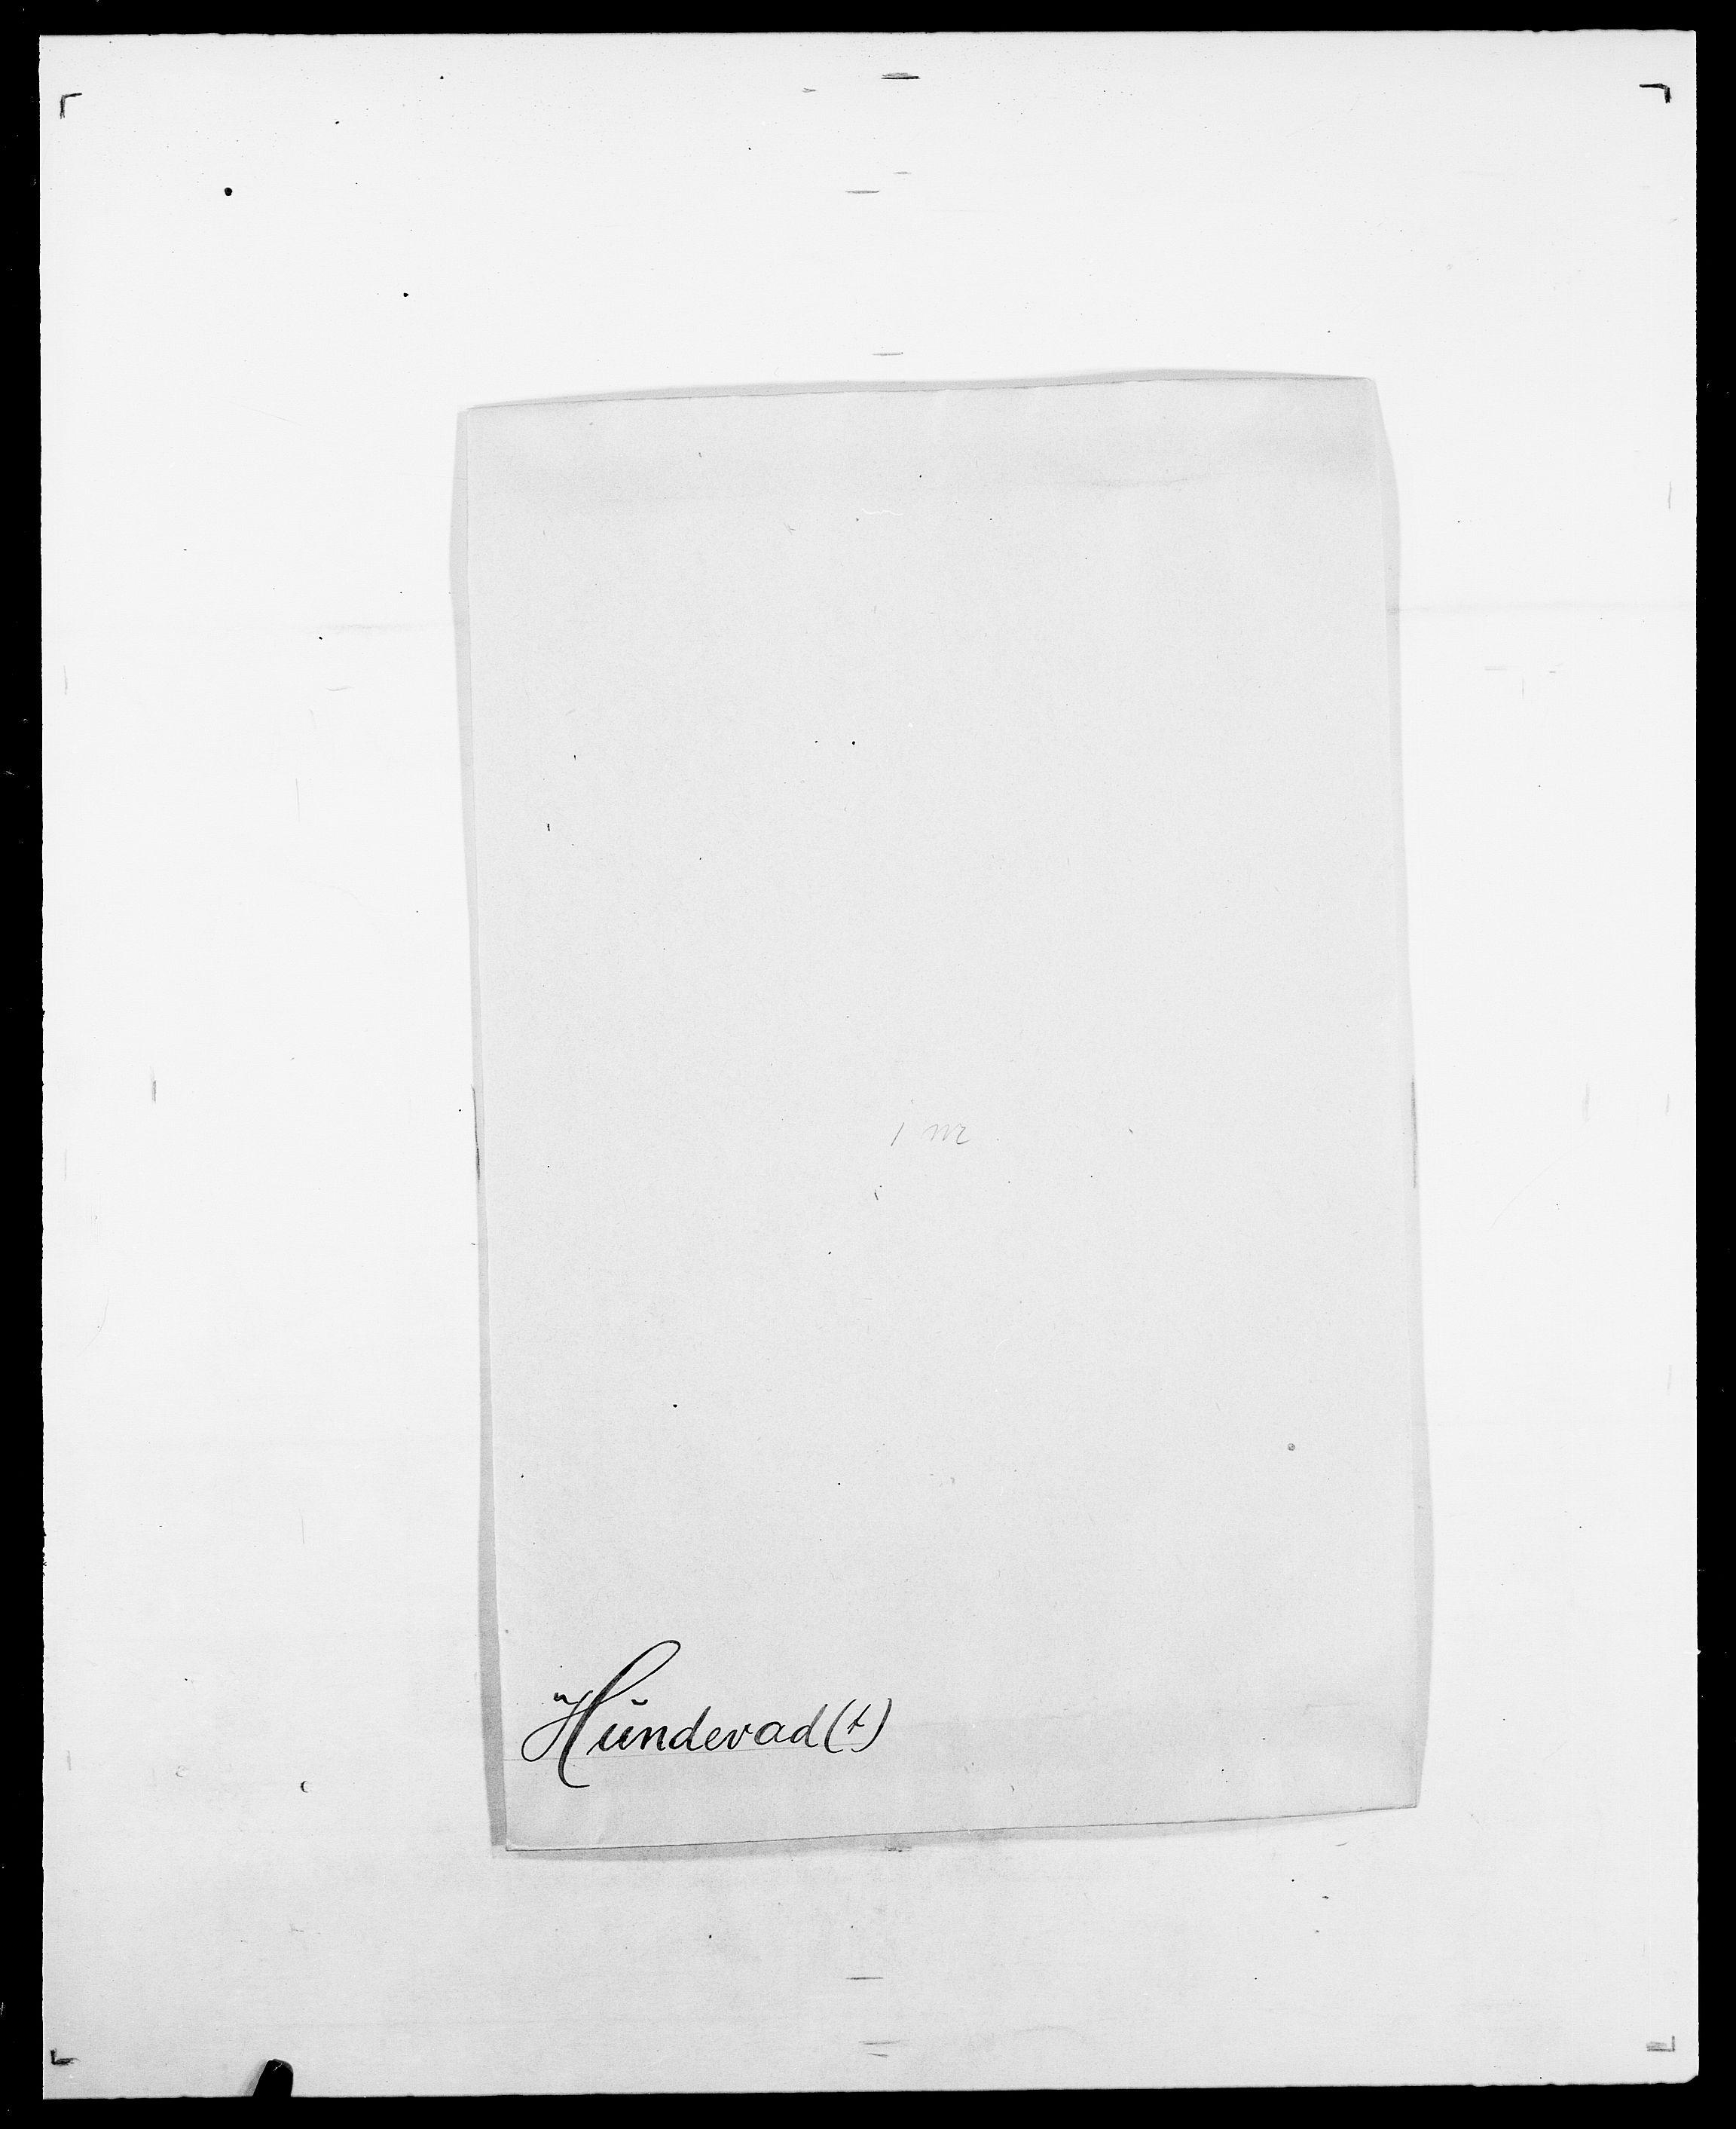 SAO, Delgobe, Charles Antoine - samling, D/Da/L0019: van der Hude - Joys, s. 65